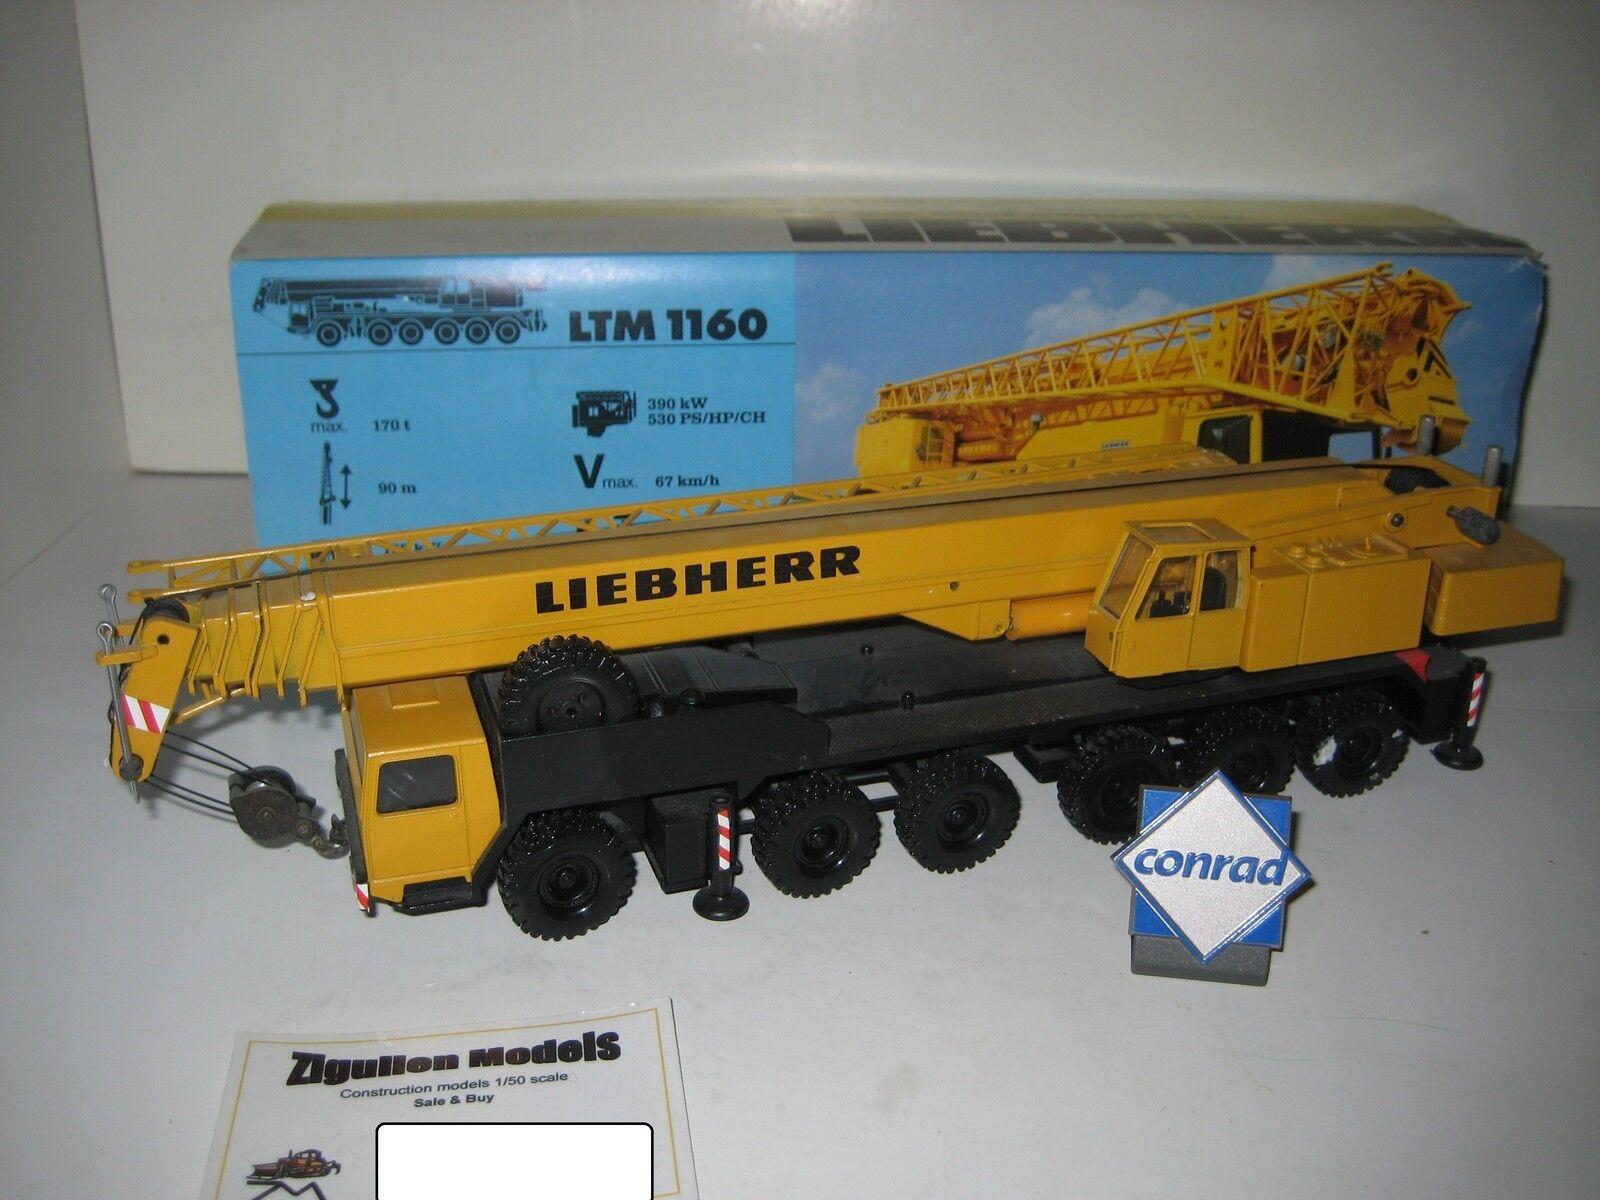 Liebherr ltm 1160 autokran  2082.3 conrad 1 50 original packaging